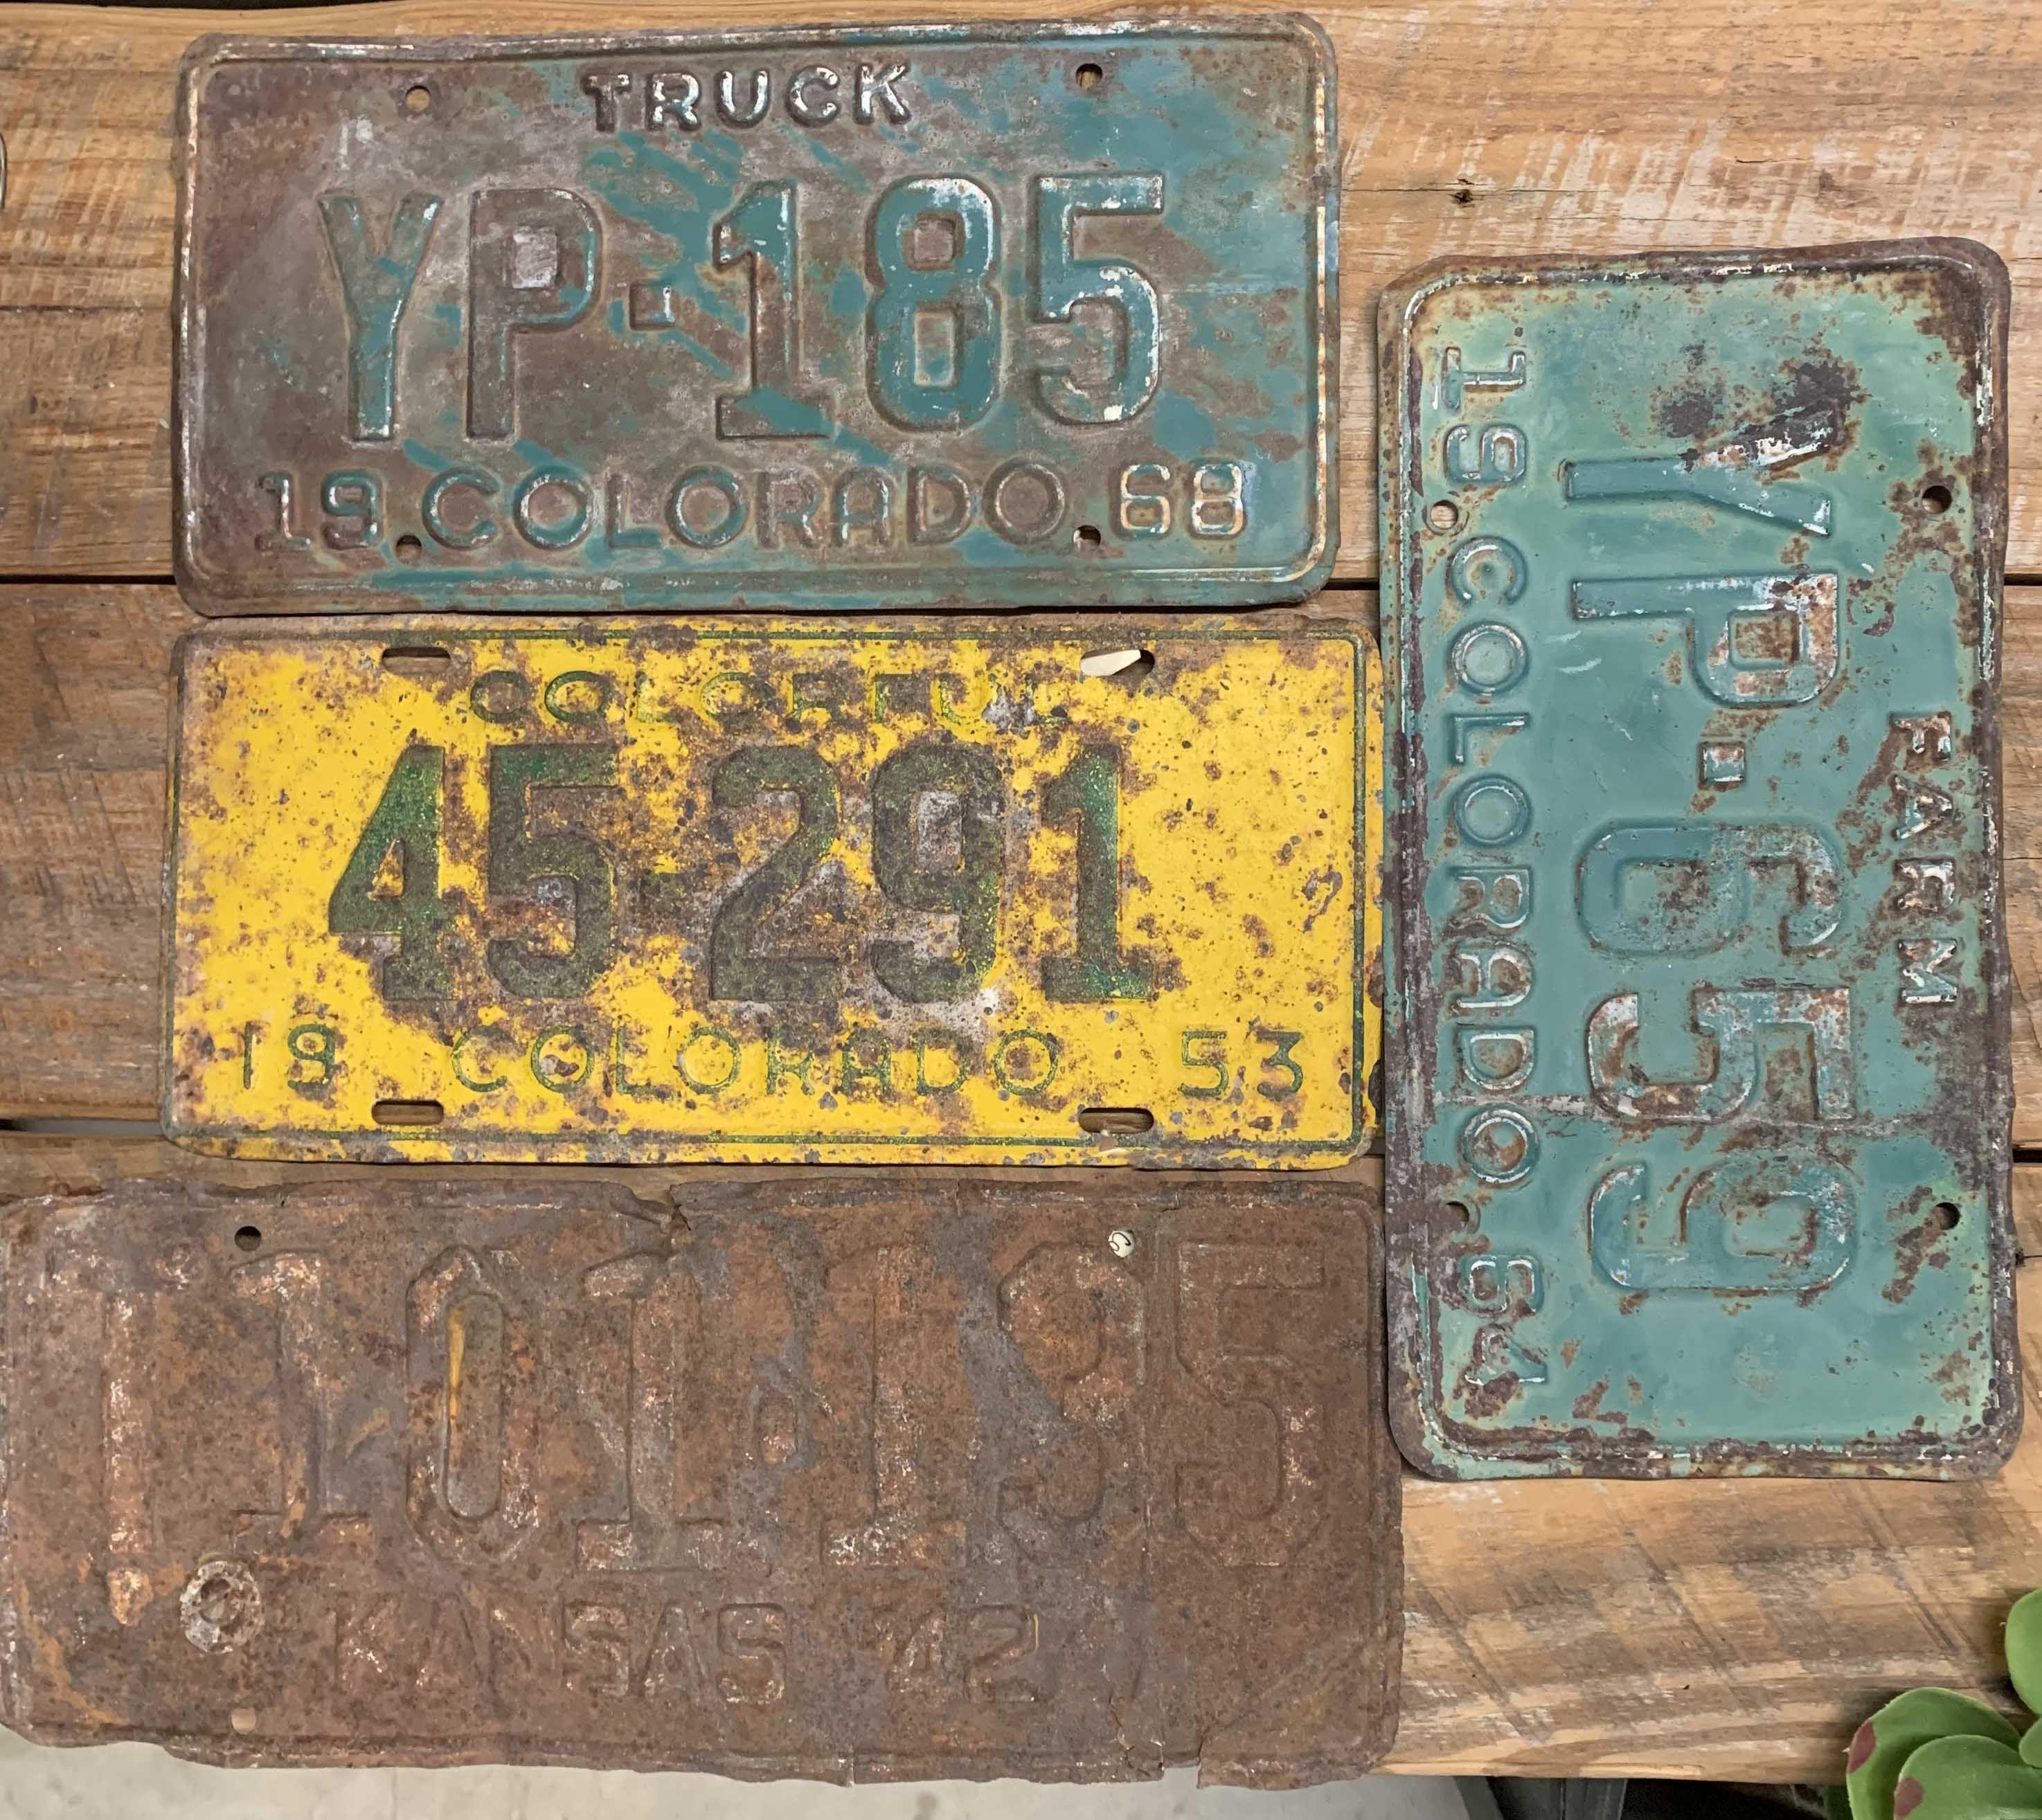 Vintage License Plates On Sale 10 to 25 Each Vintage